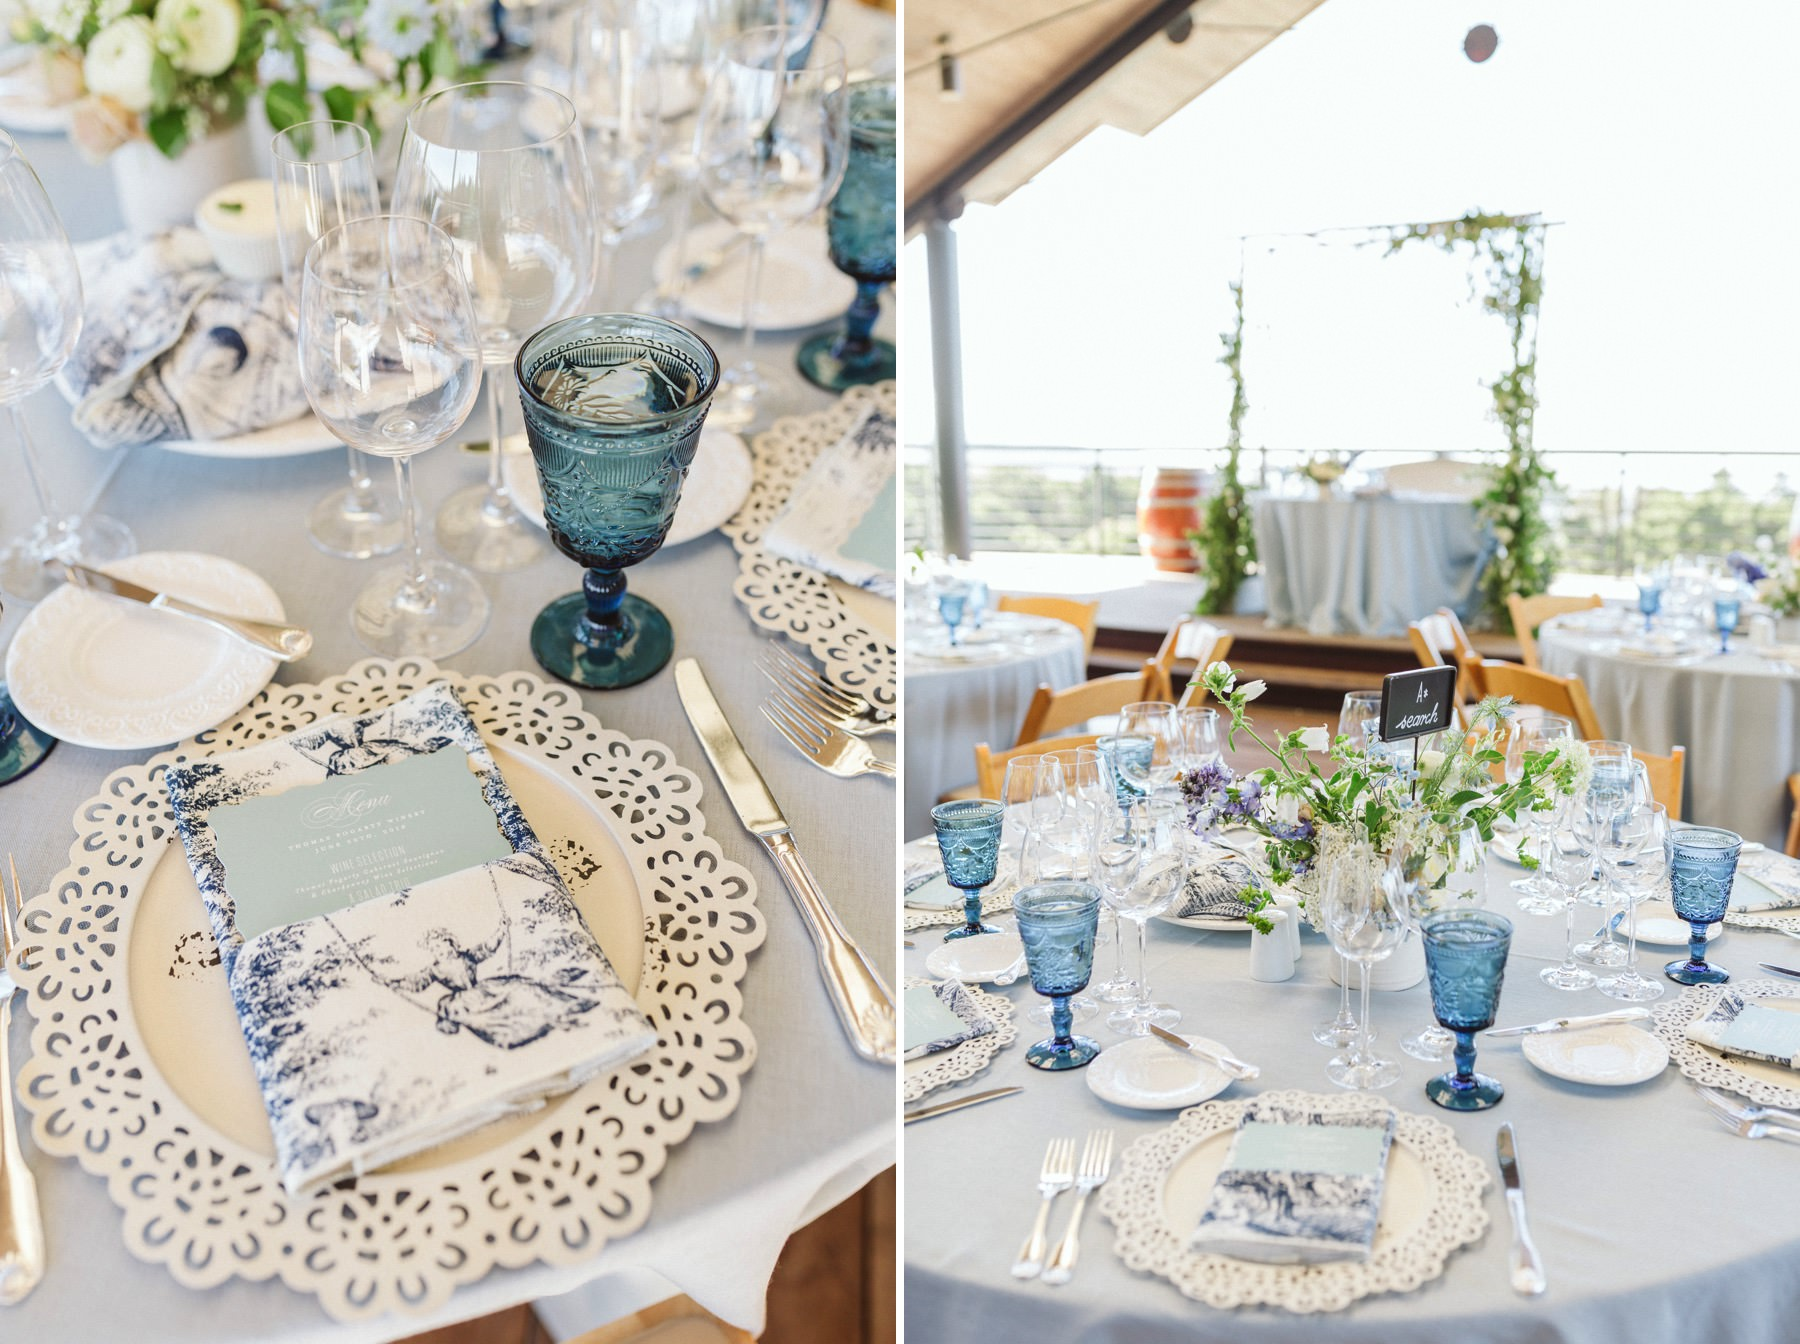 Thomas Fogarty wedding styling